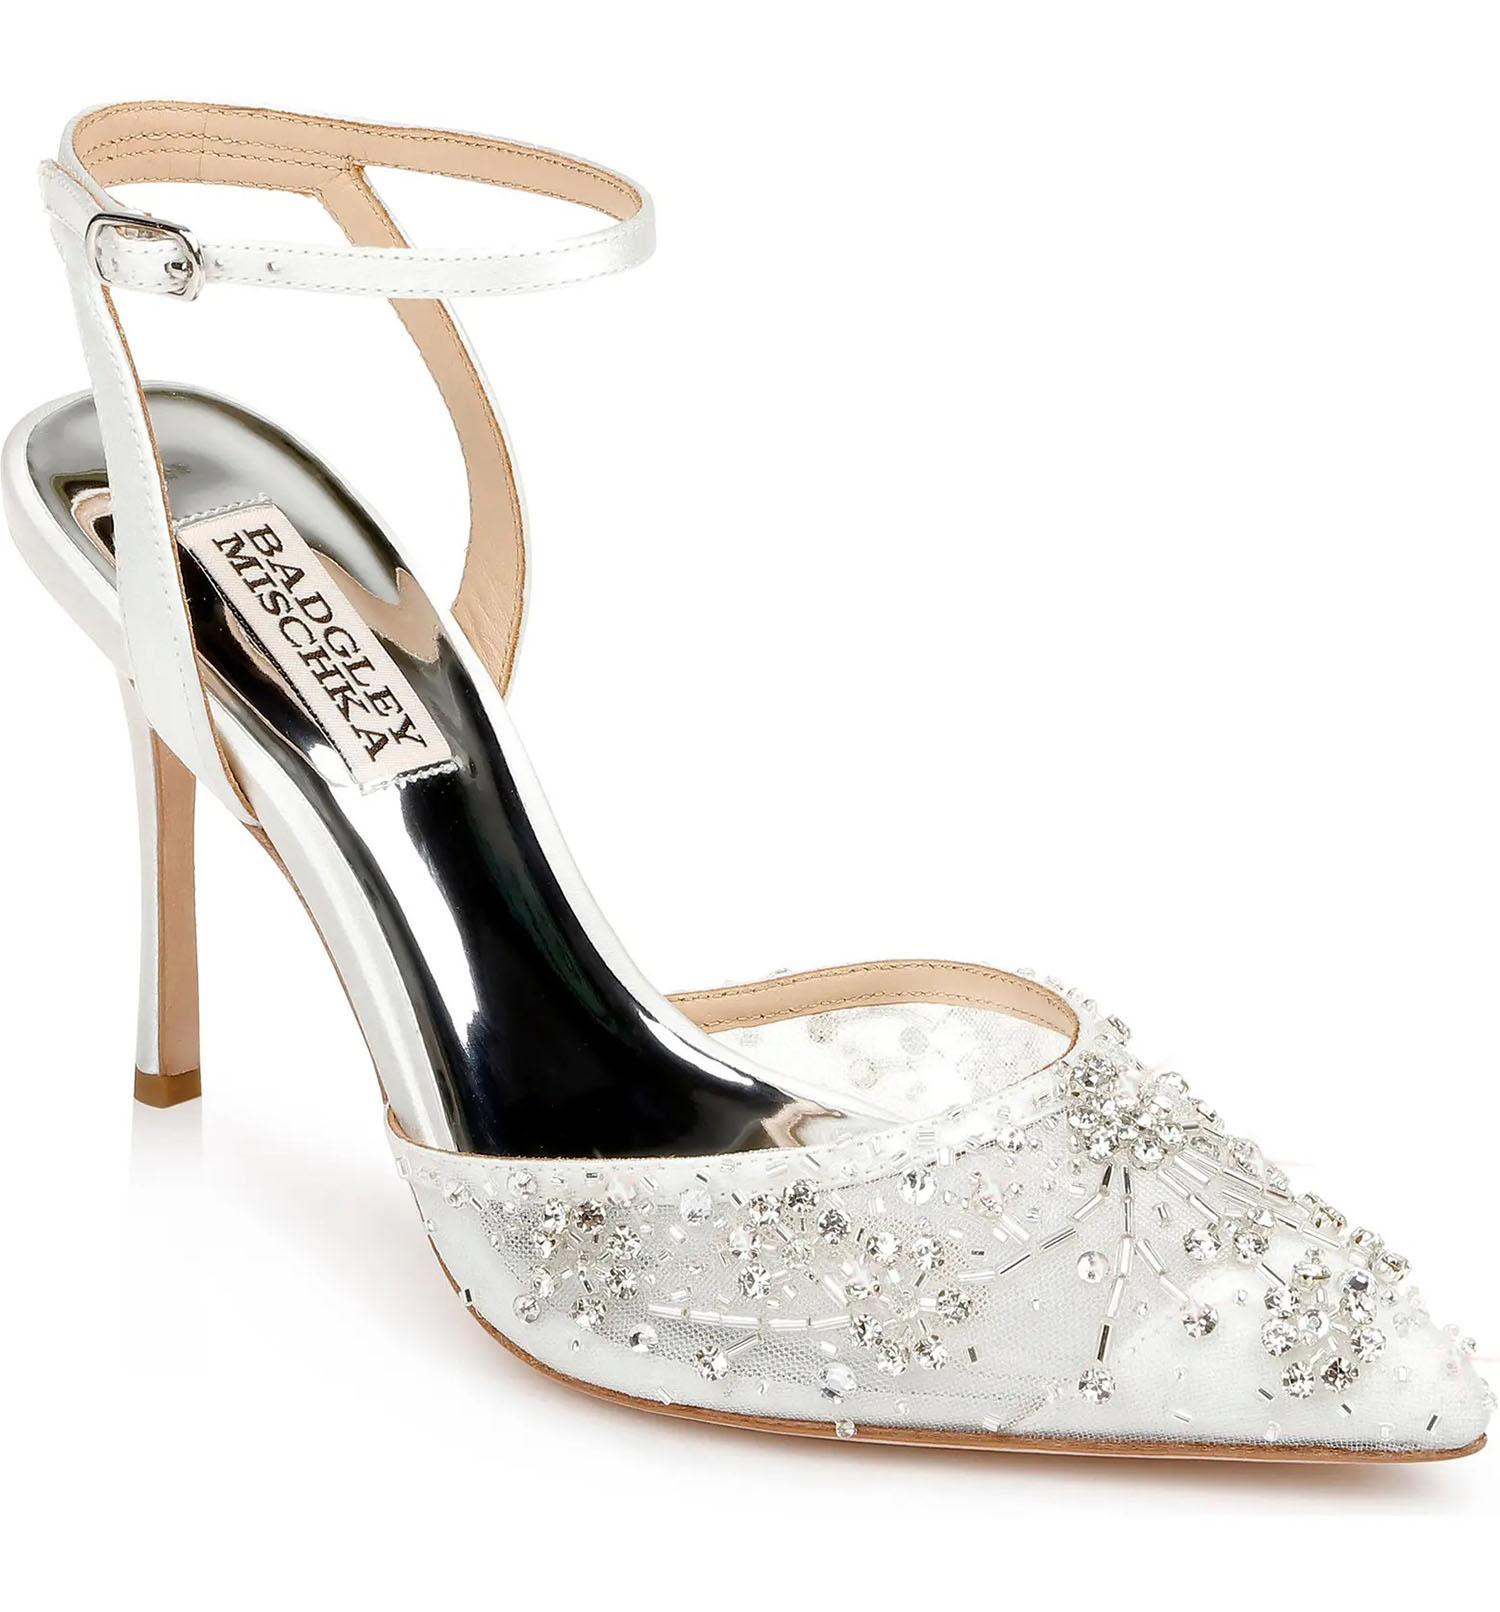 crystal beaded white pointed toe heel Badgley Mischka wedding shoes